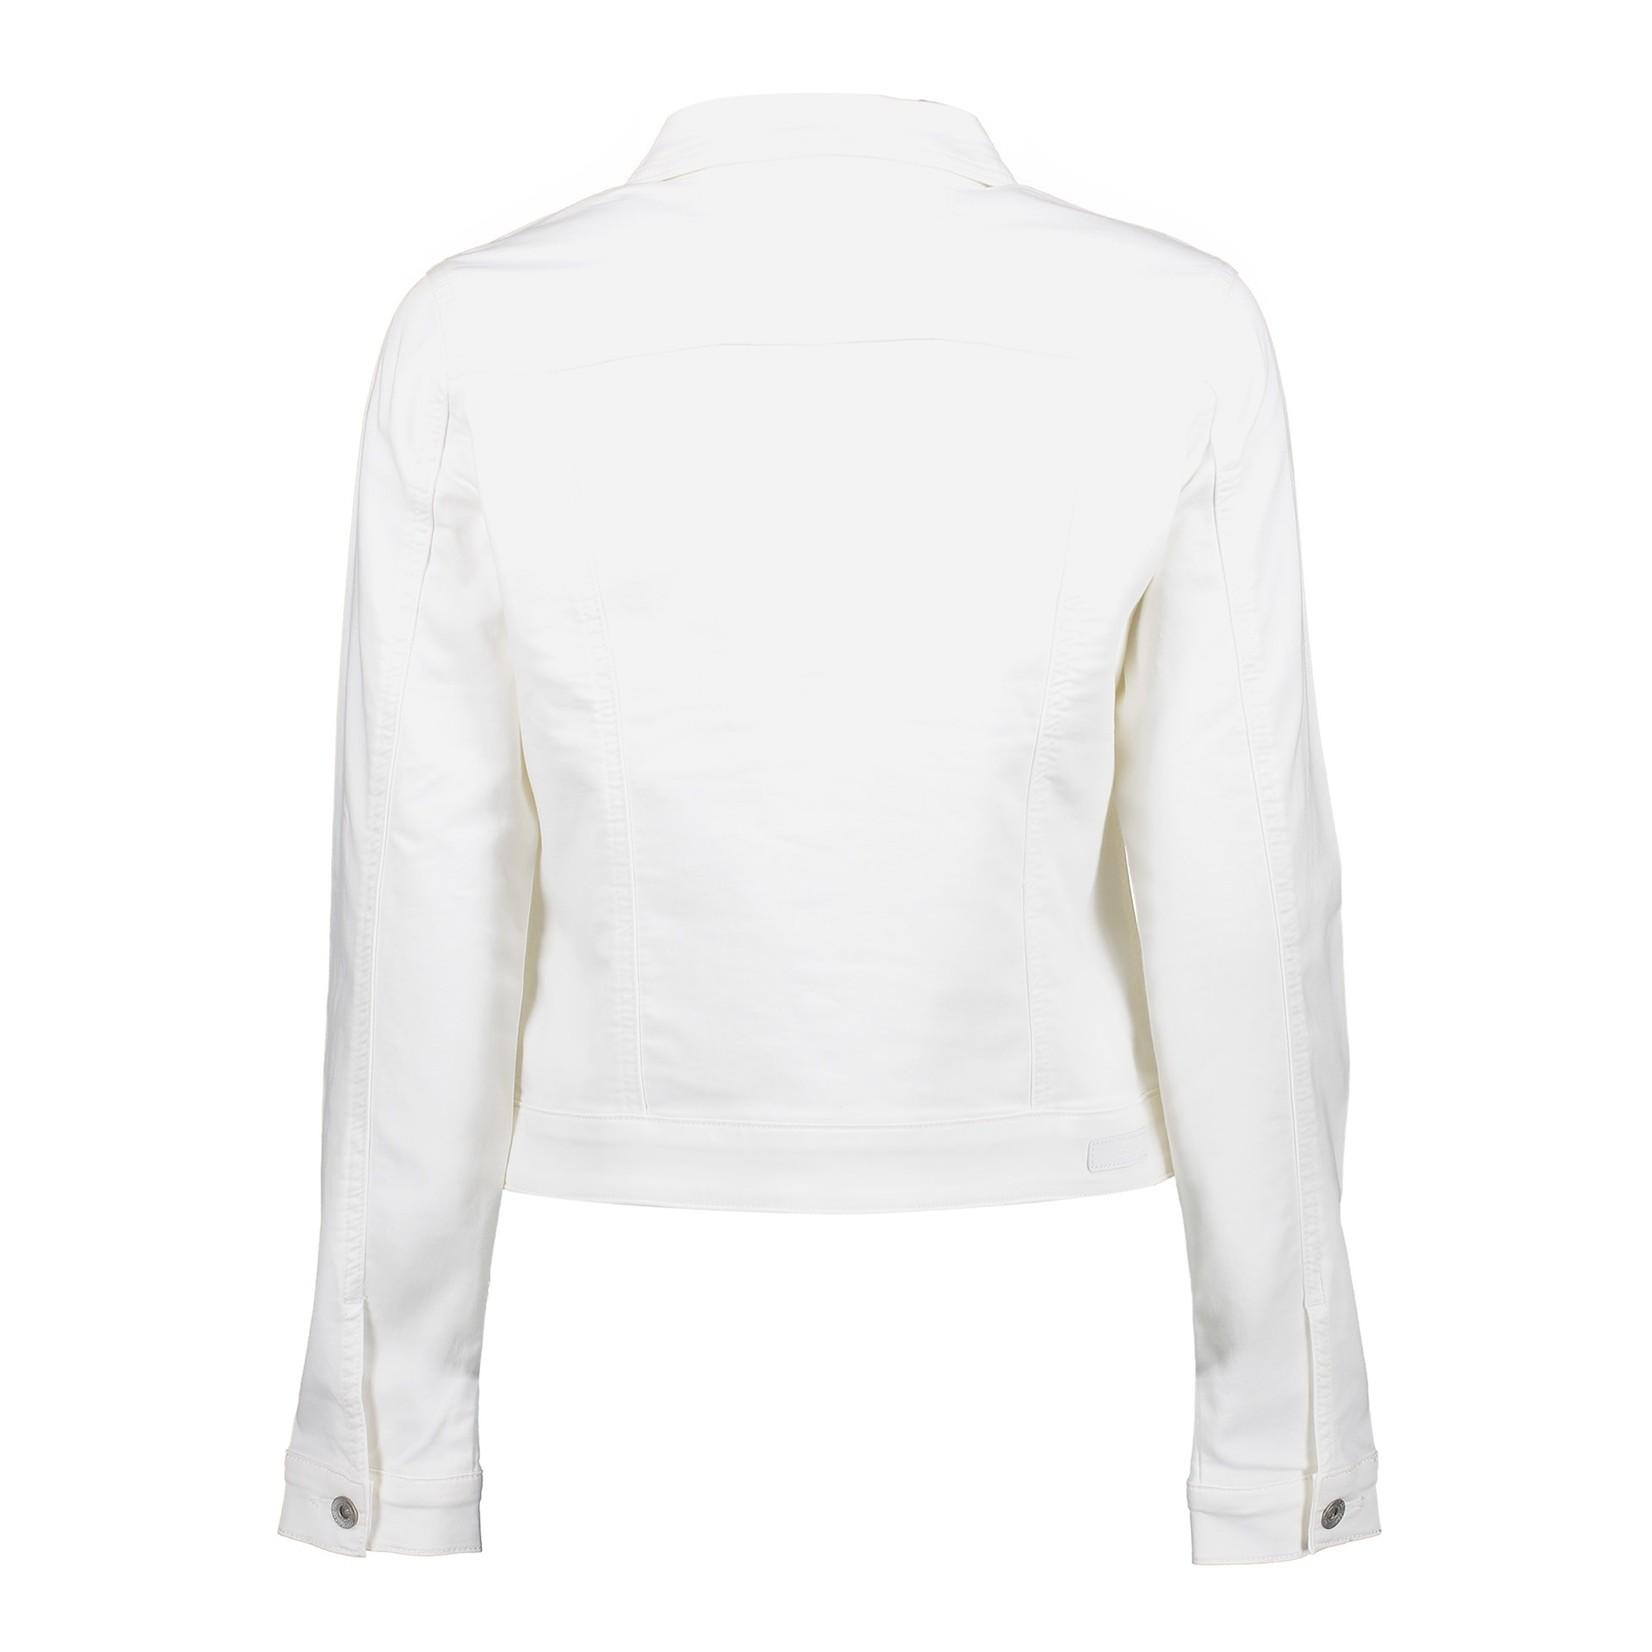 Geisha Geisha jeansjacket white denim 15005-10